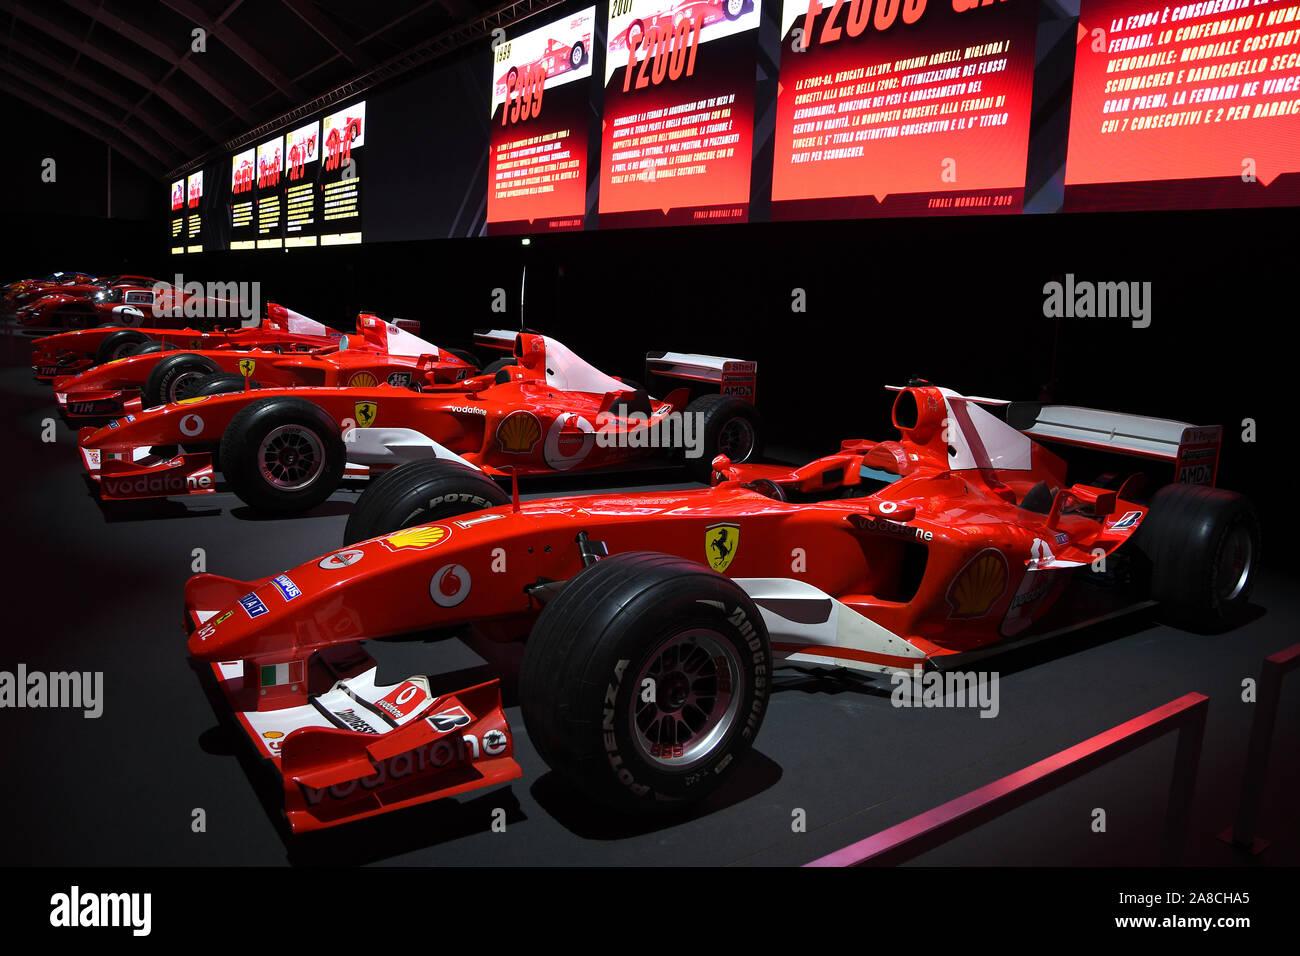 MUGELLO, IT, 24 October 2019: Detail of Modern Era Ferrari F1 ex Michael Schumacher on display at Mugello Circuit in italy Stock Photo